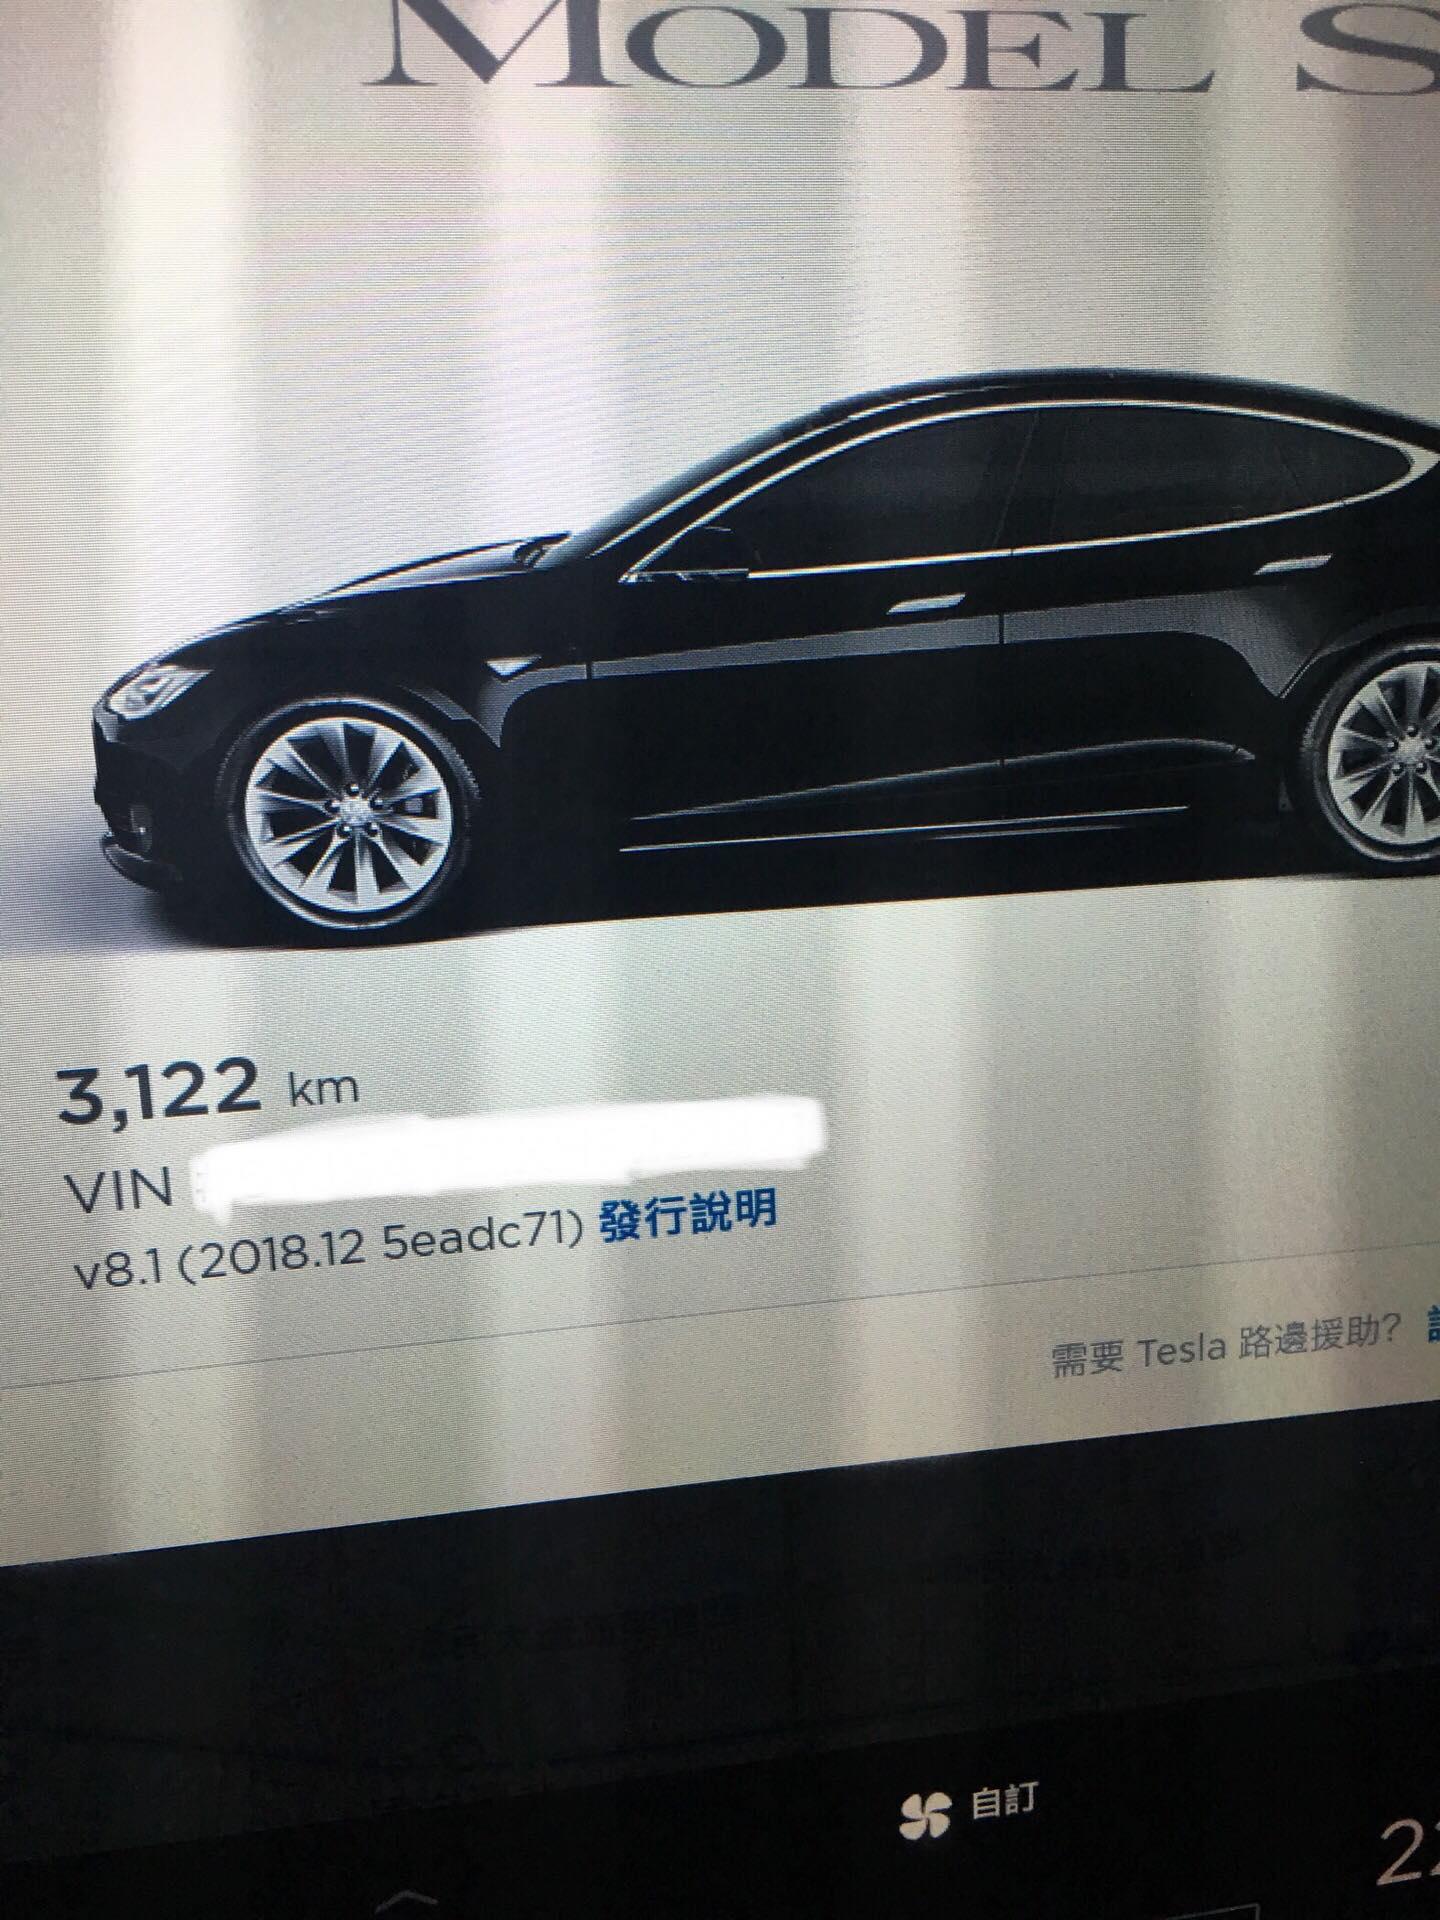 Model S old MCU 2018.12 [Credit: Michael Hsu/Facebook]